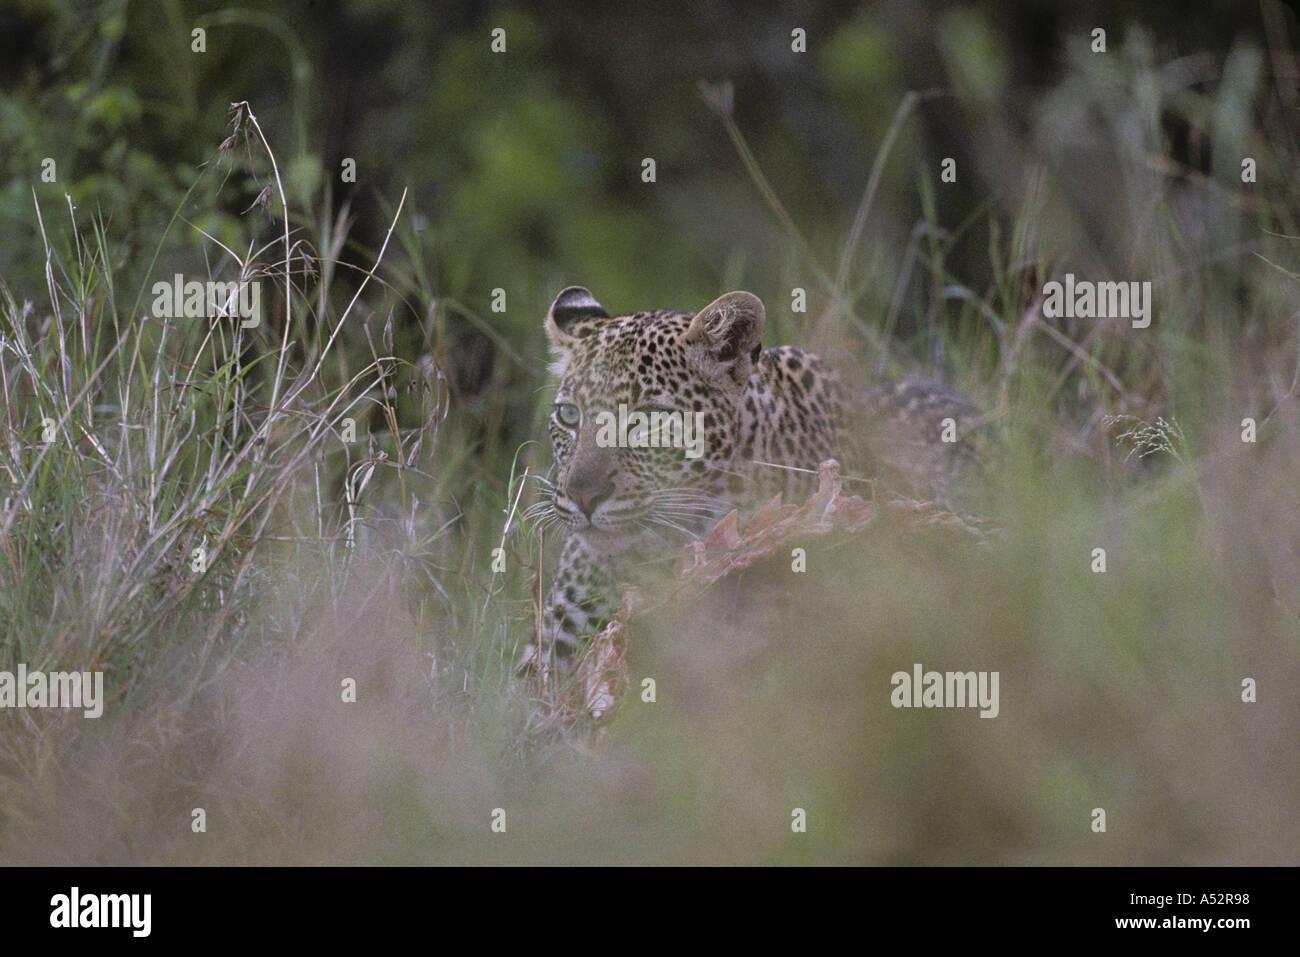 Africa Kenya Masai Mara Game Reserve Adolescent Male Leopard Panthera pardus feeding on Wildebeest kill  Stock Photo